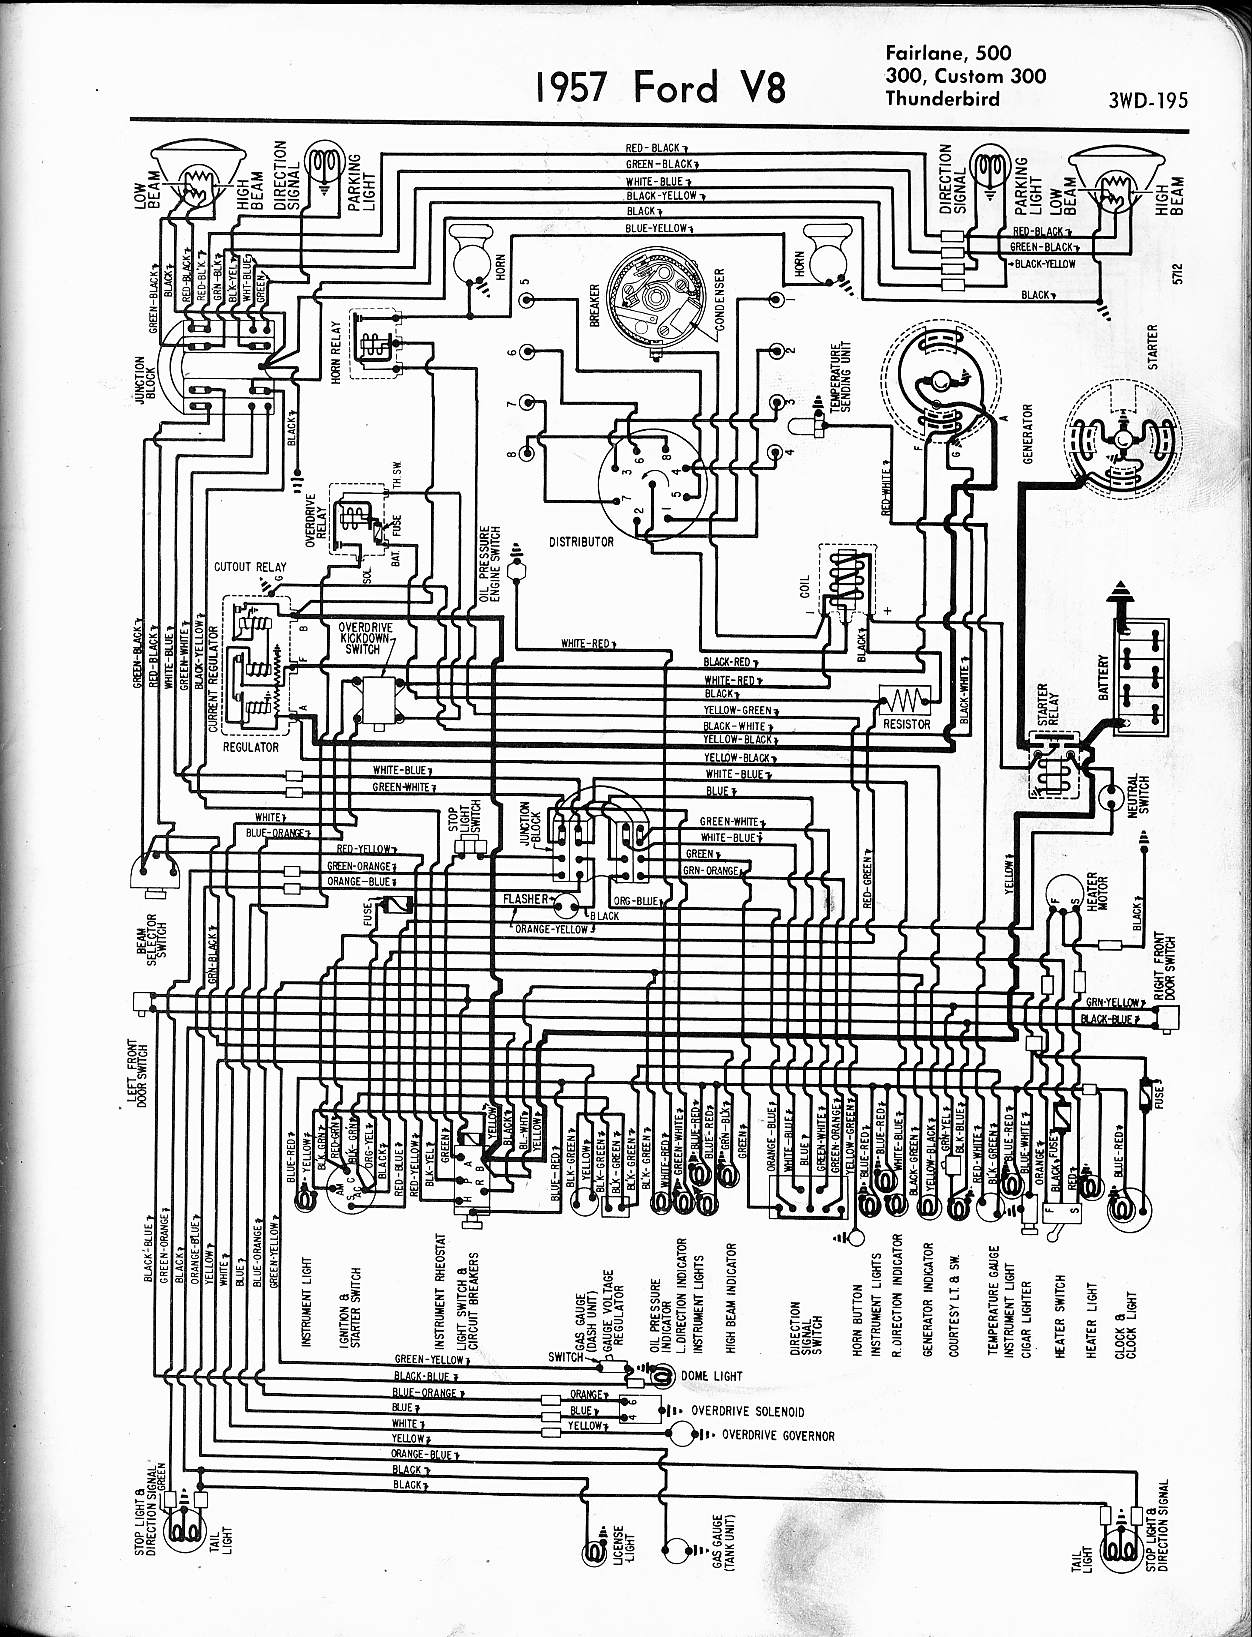 Cool 1955 Ford Radio Wiring Wiring Diagram Wiring Cloud Uslyletkolfr09Org